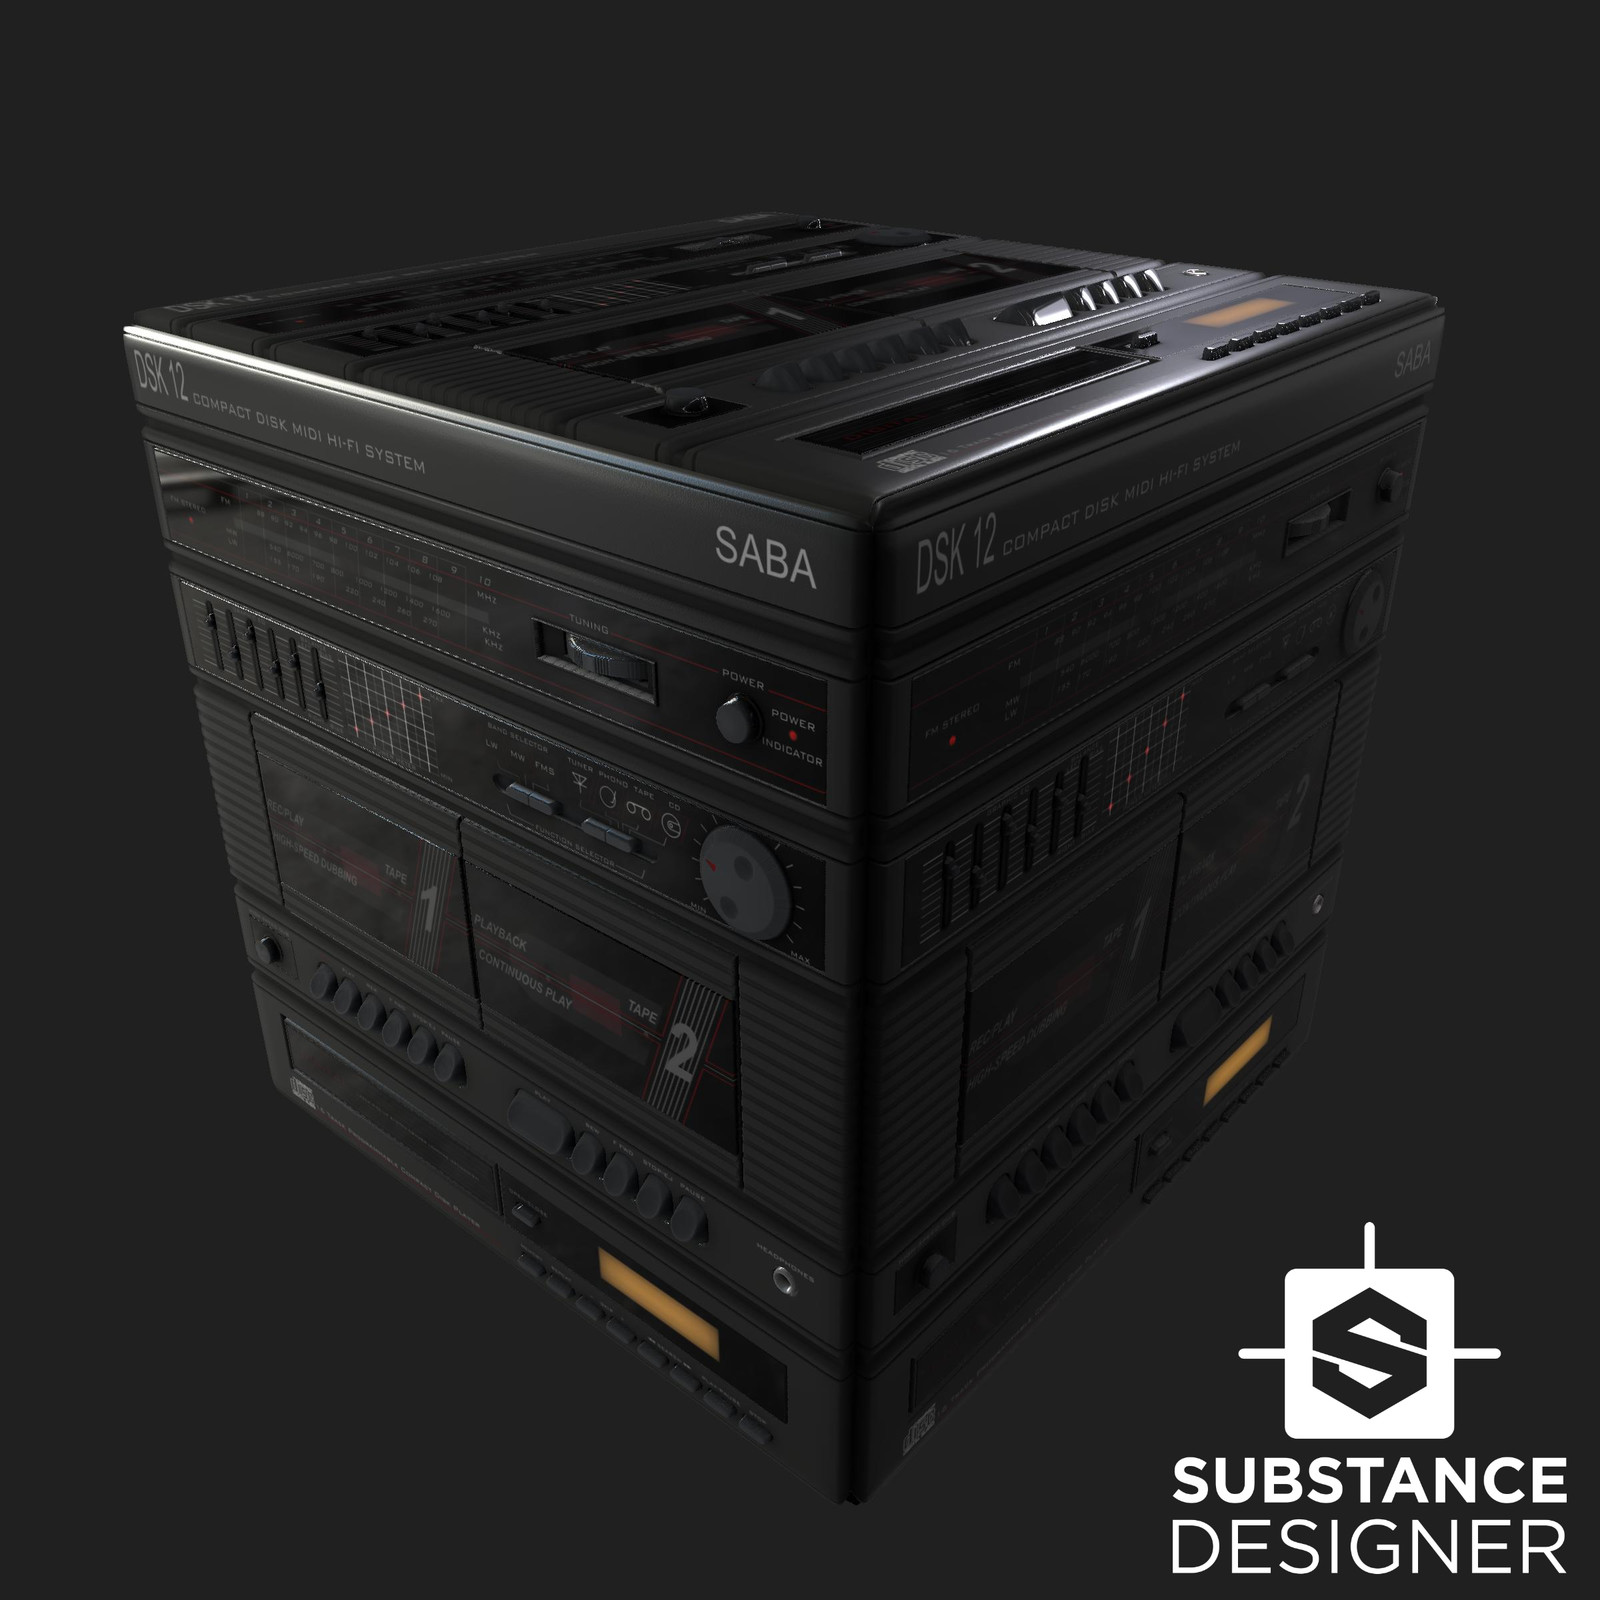 Substance Designer - SABA Midi Hi-Fi System